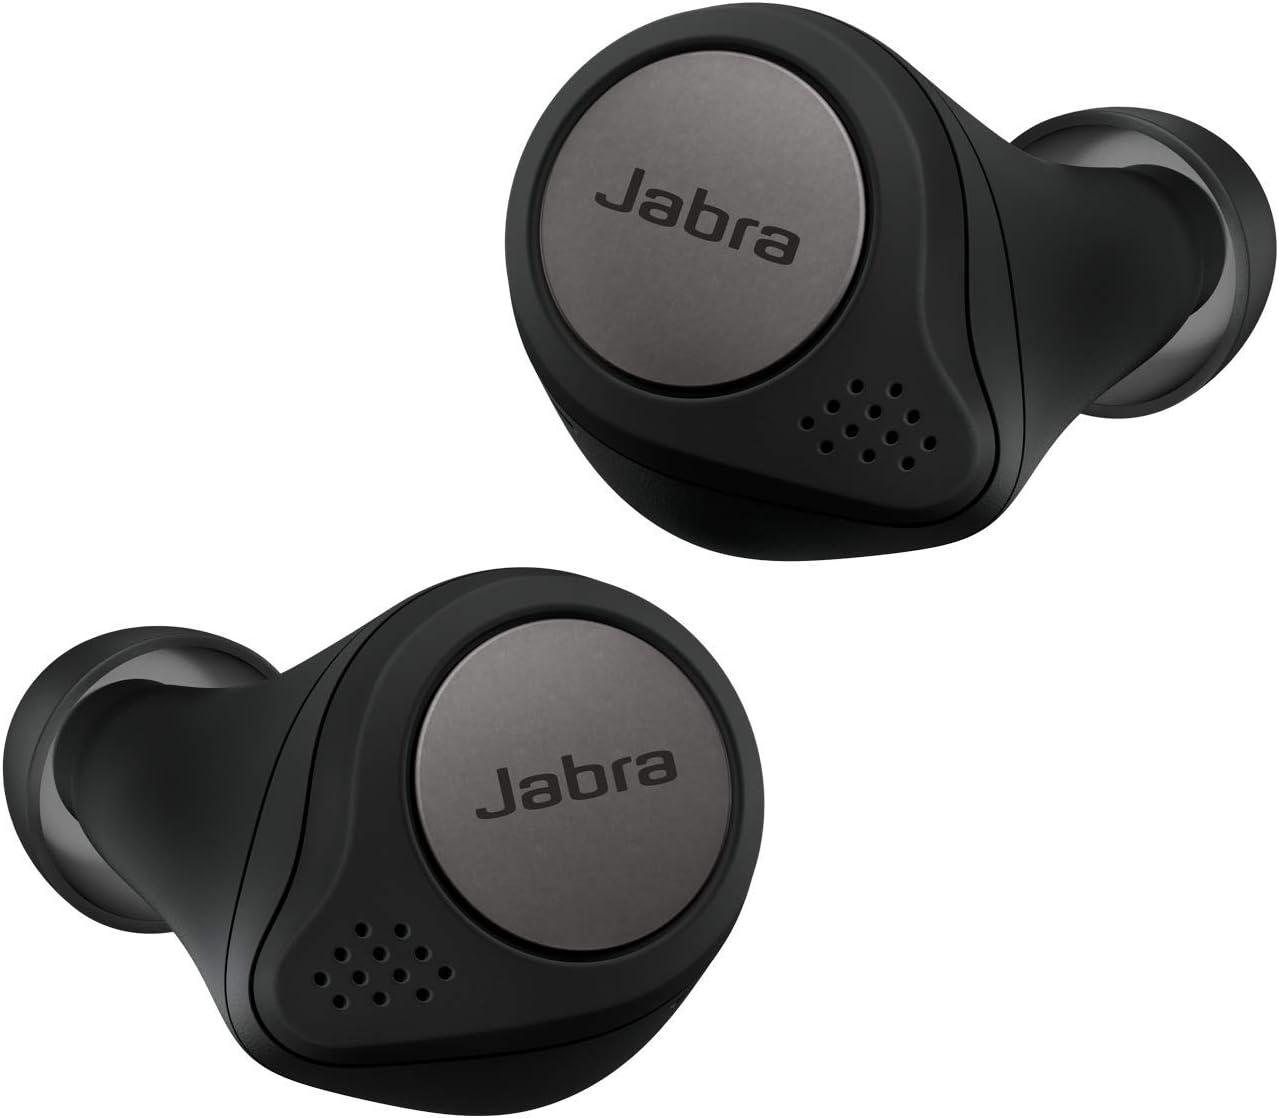 Jabra Elite Active 75t - Auriculares inalámbricos para deporte (Bluetooth 5.0, True Wireless), Negro y Titanio